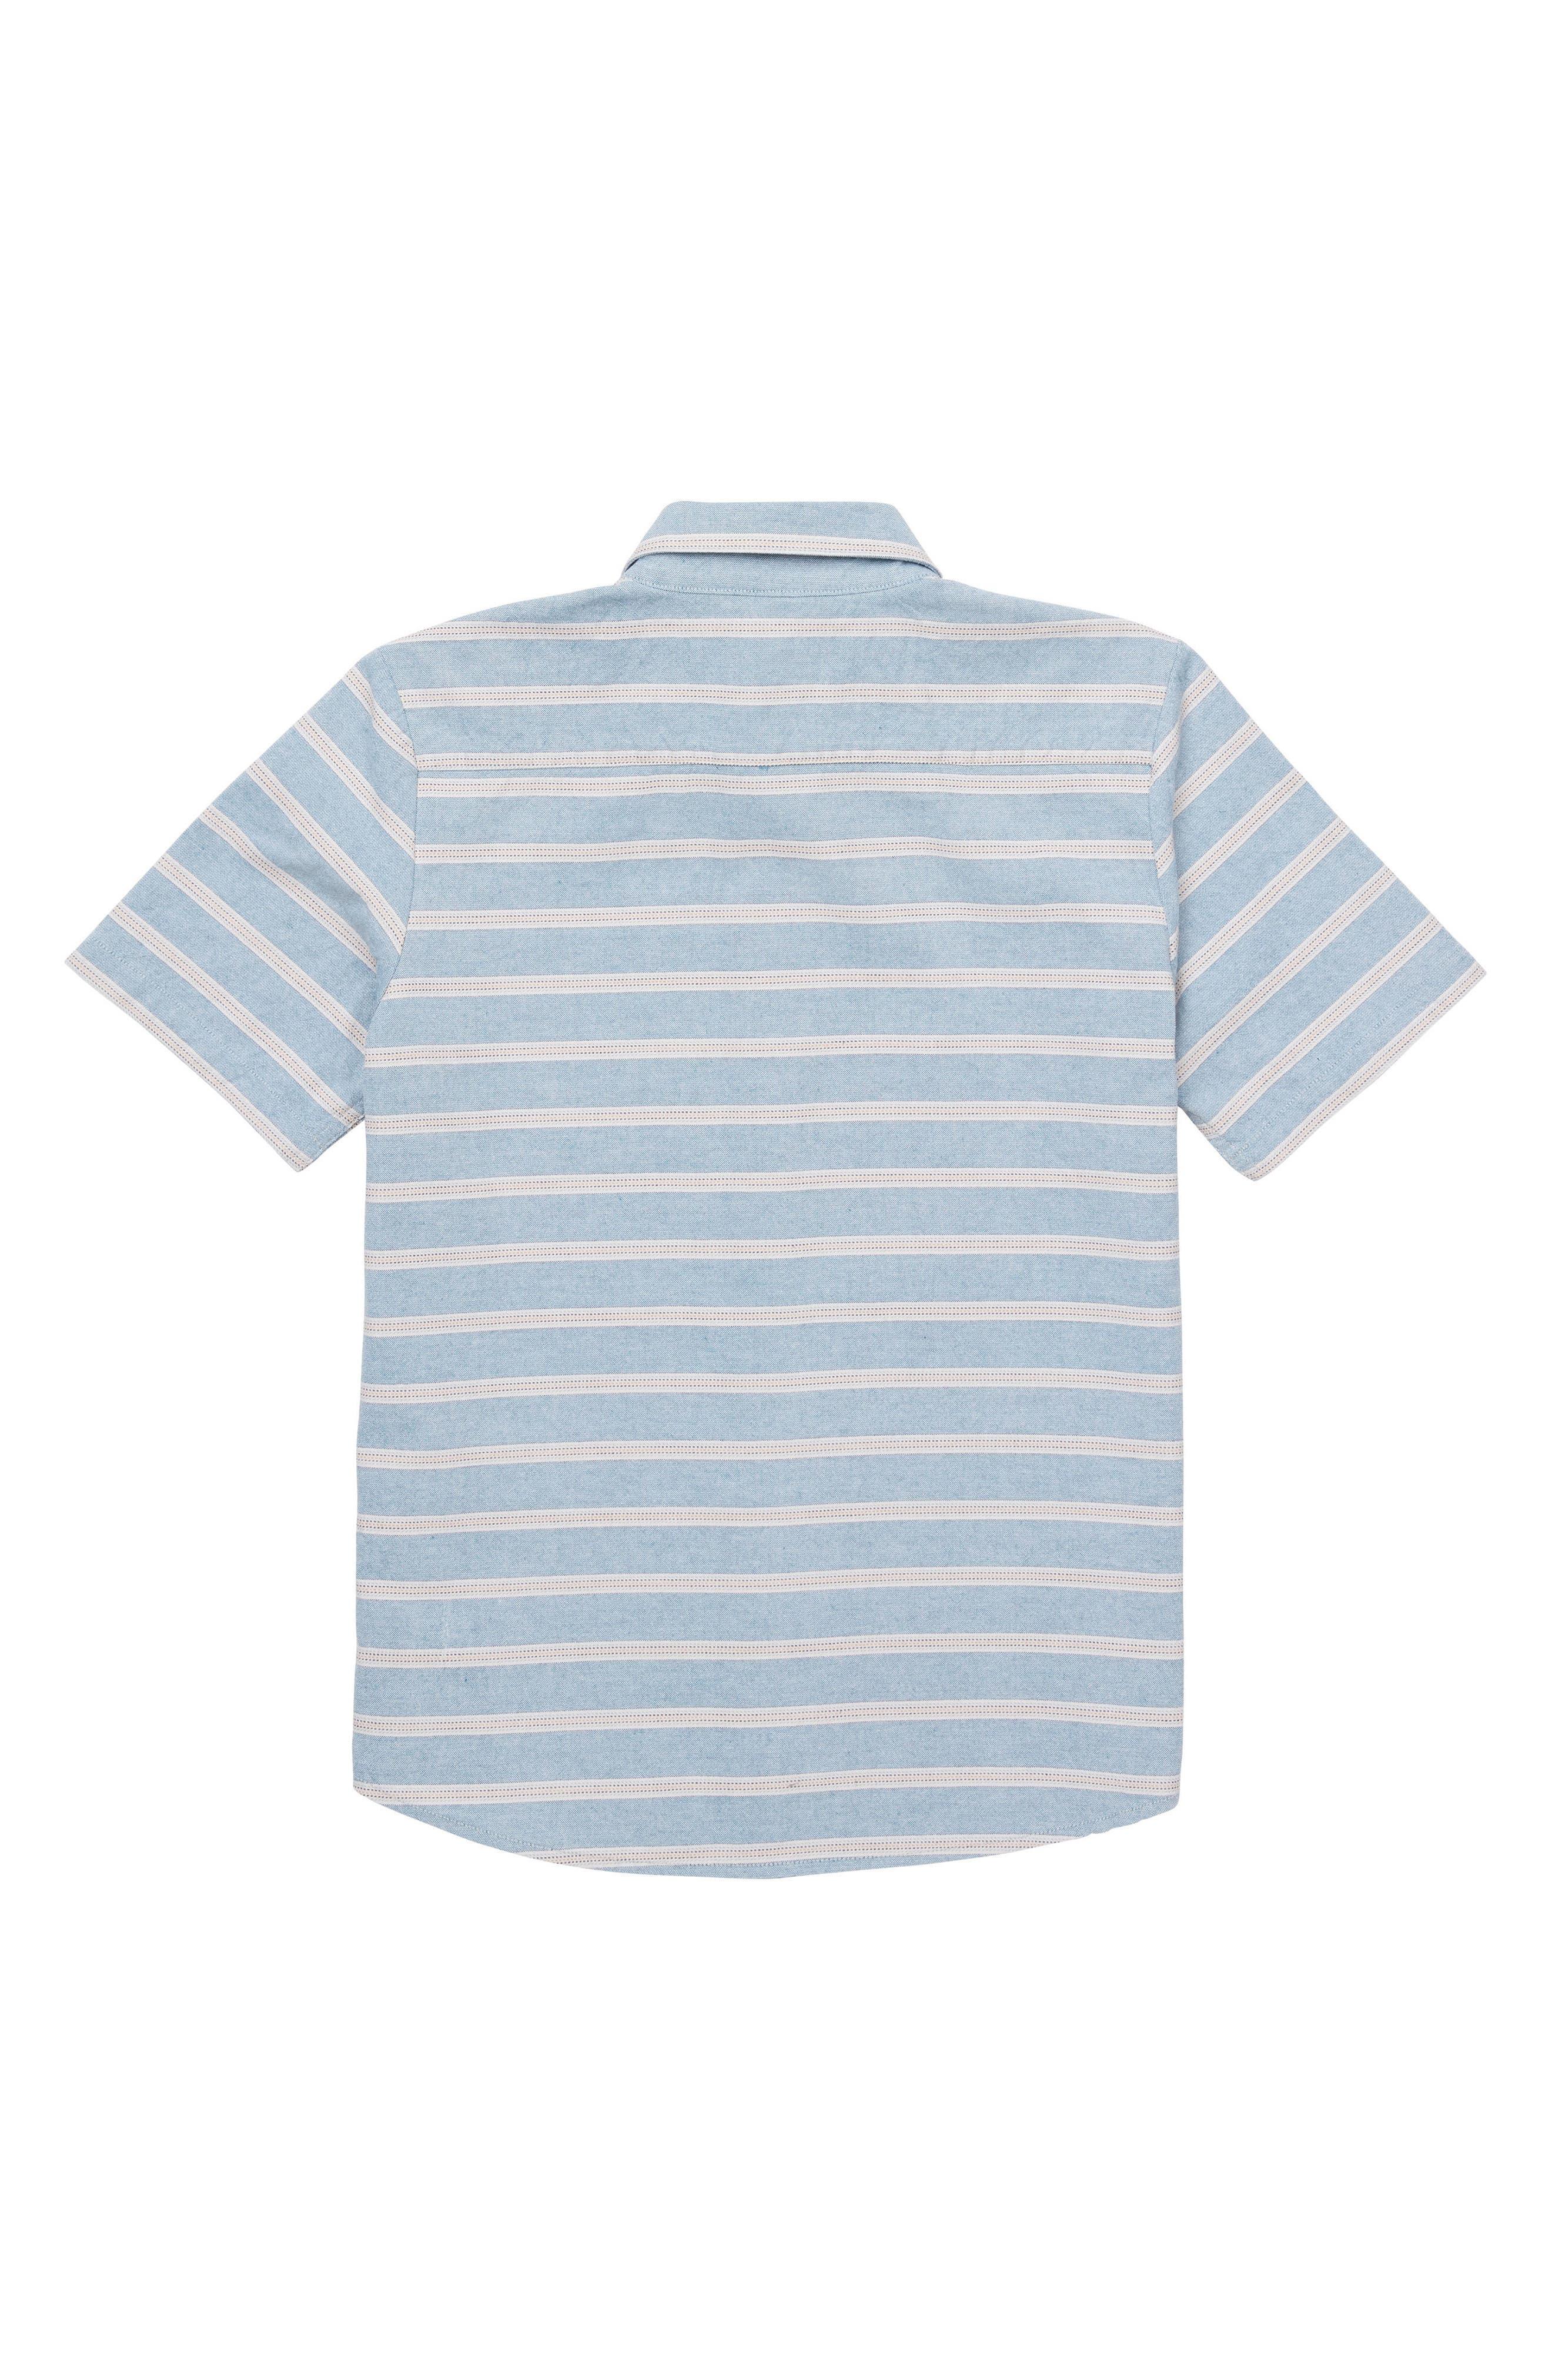 Branson Woven Shirt,                             Alternate thumbnail 2, color,                             Vintage Blue